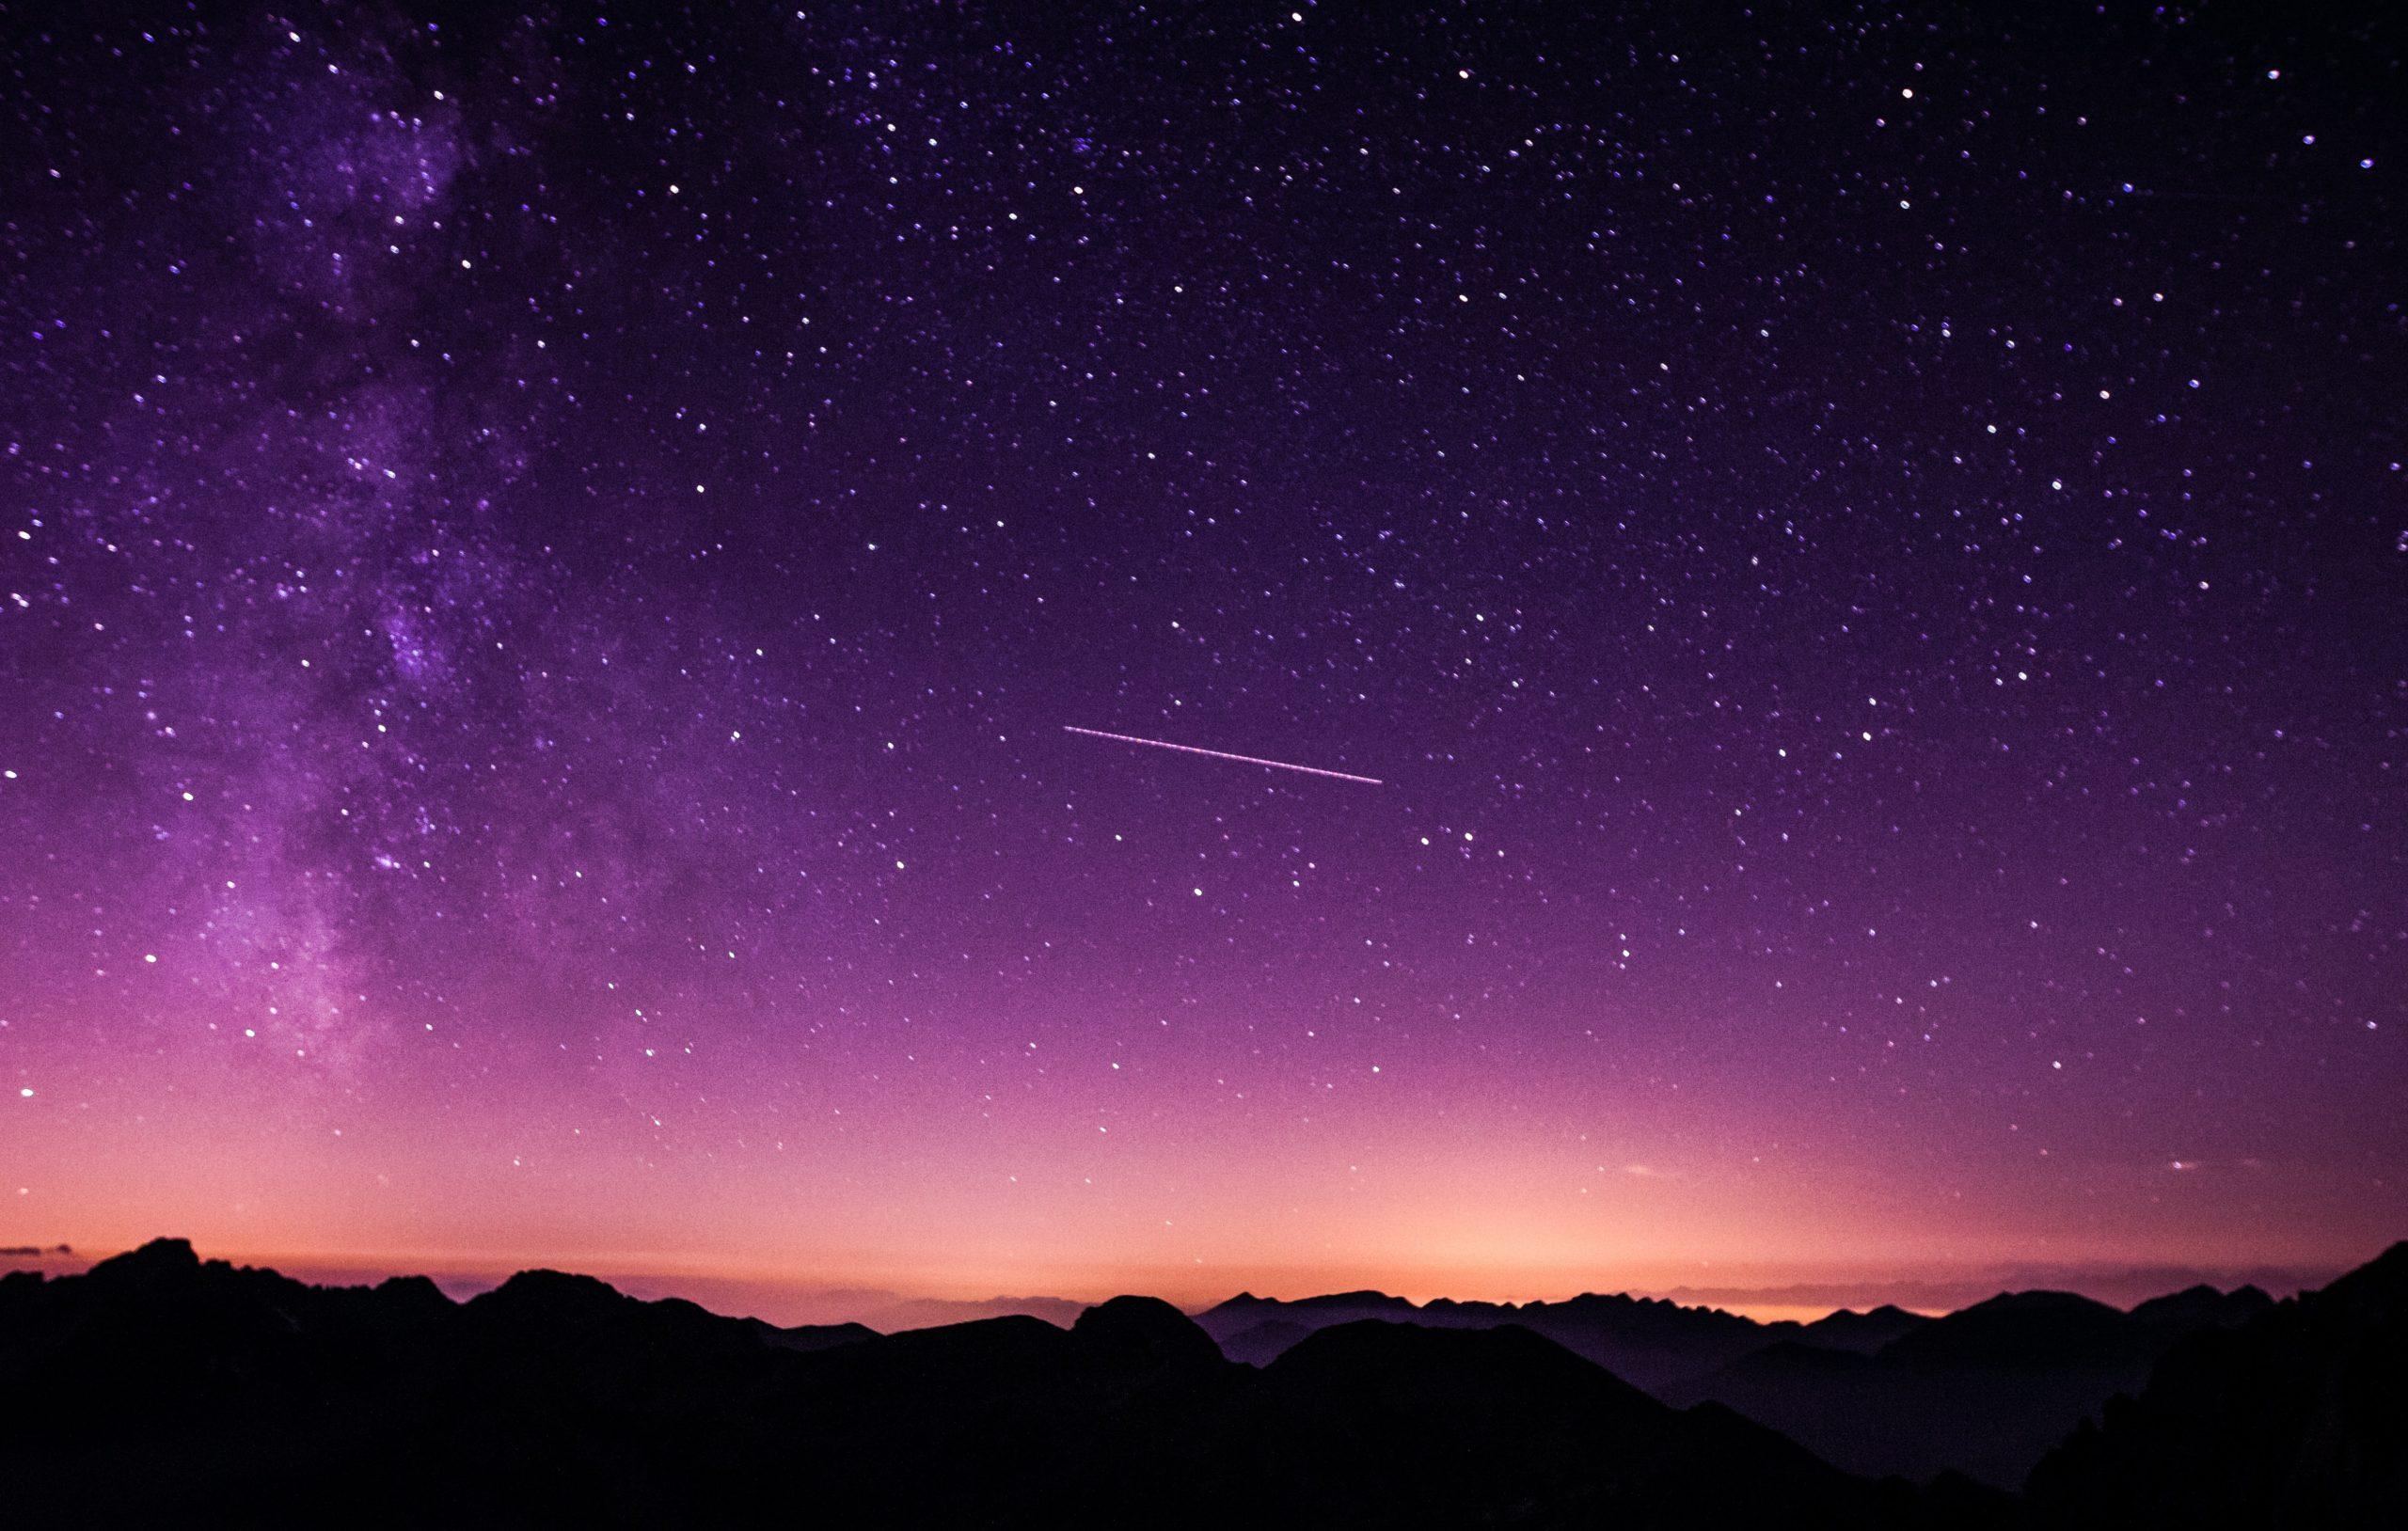 Sedm perel astronomie 2